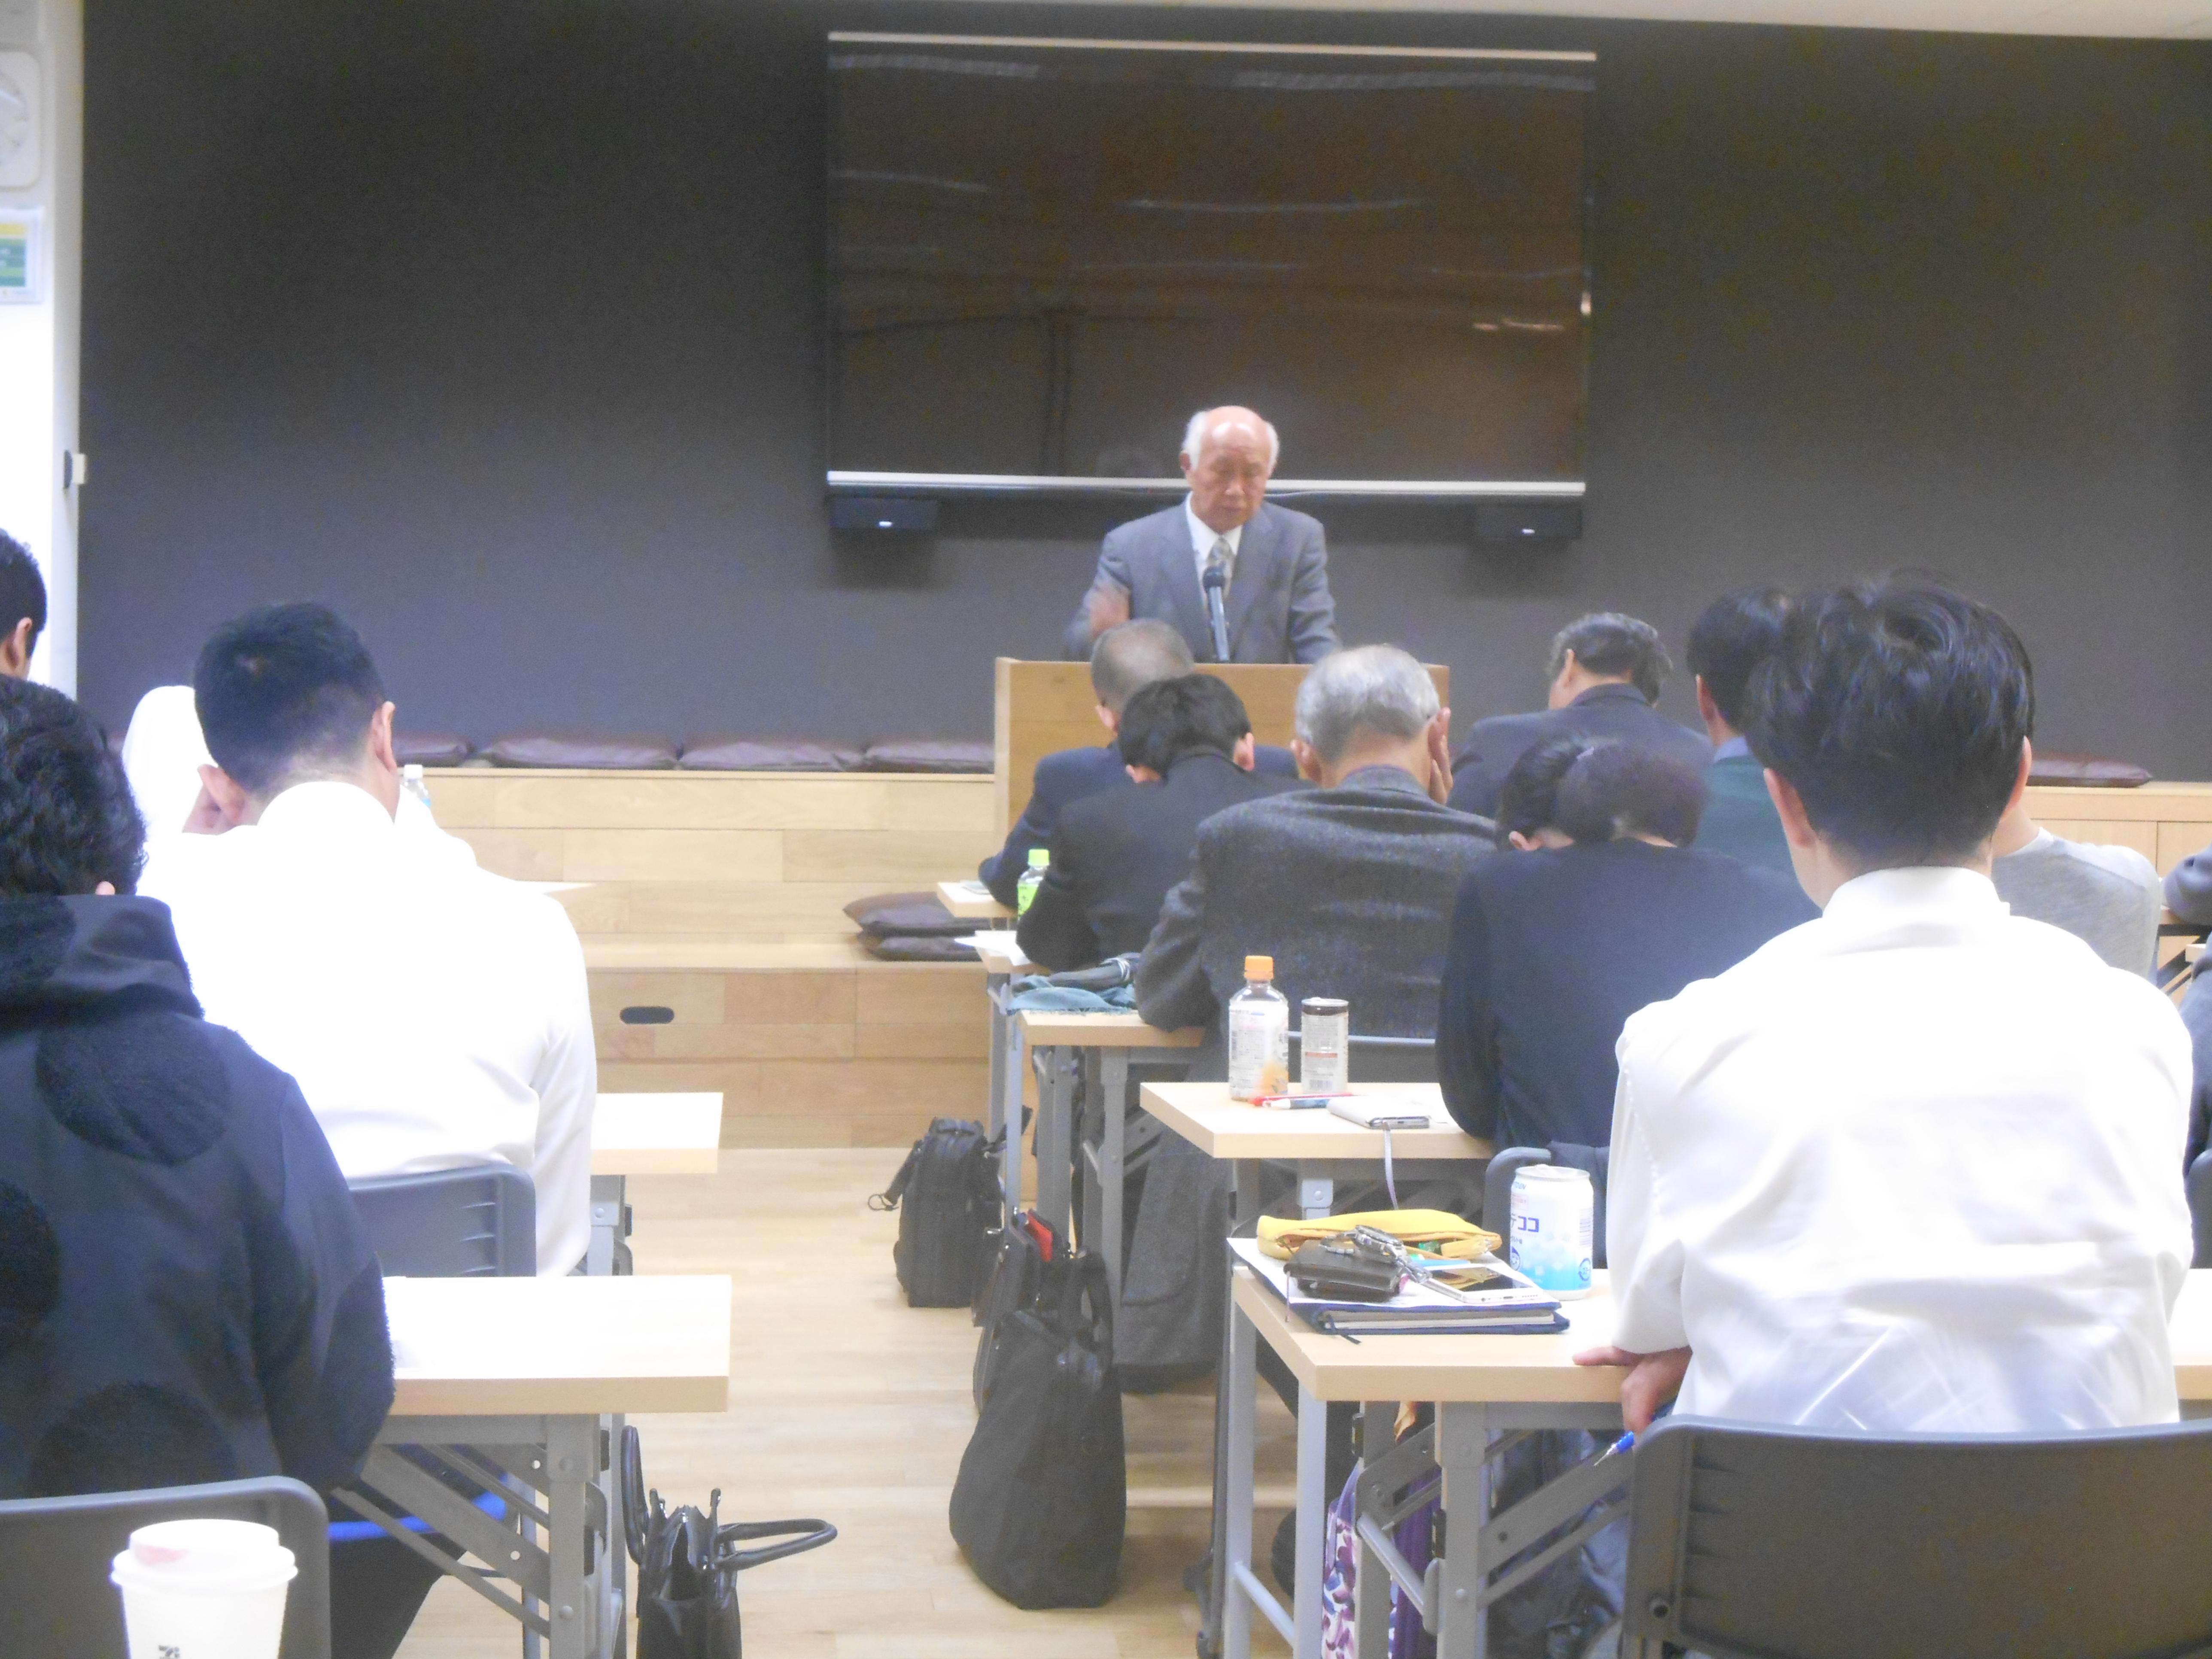 DSCN2312 - 4月1日東京思風塾の開催になります。